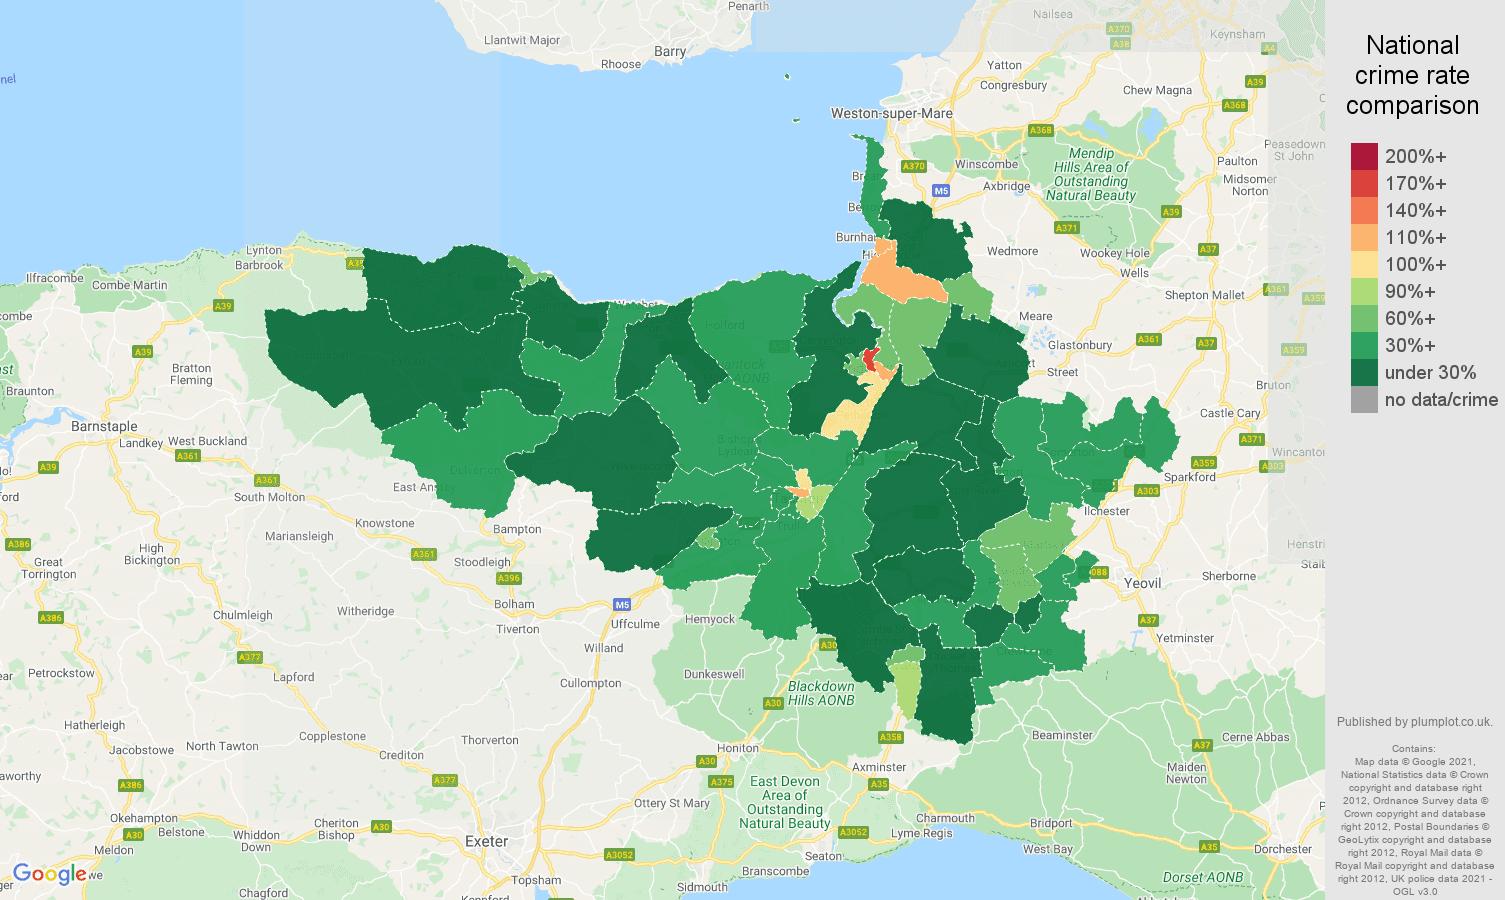 Taunton antisocial behaviour crime rate comparison map